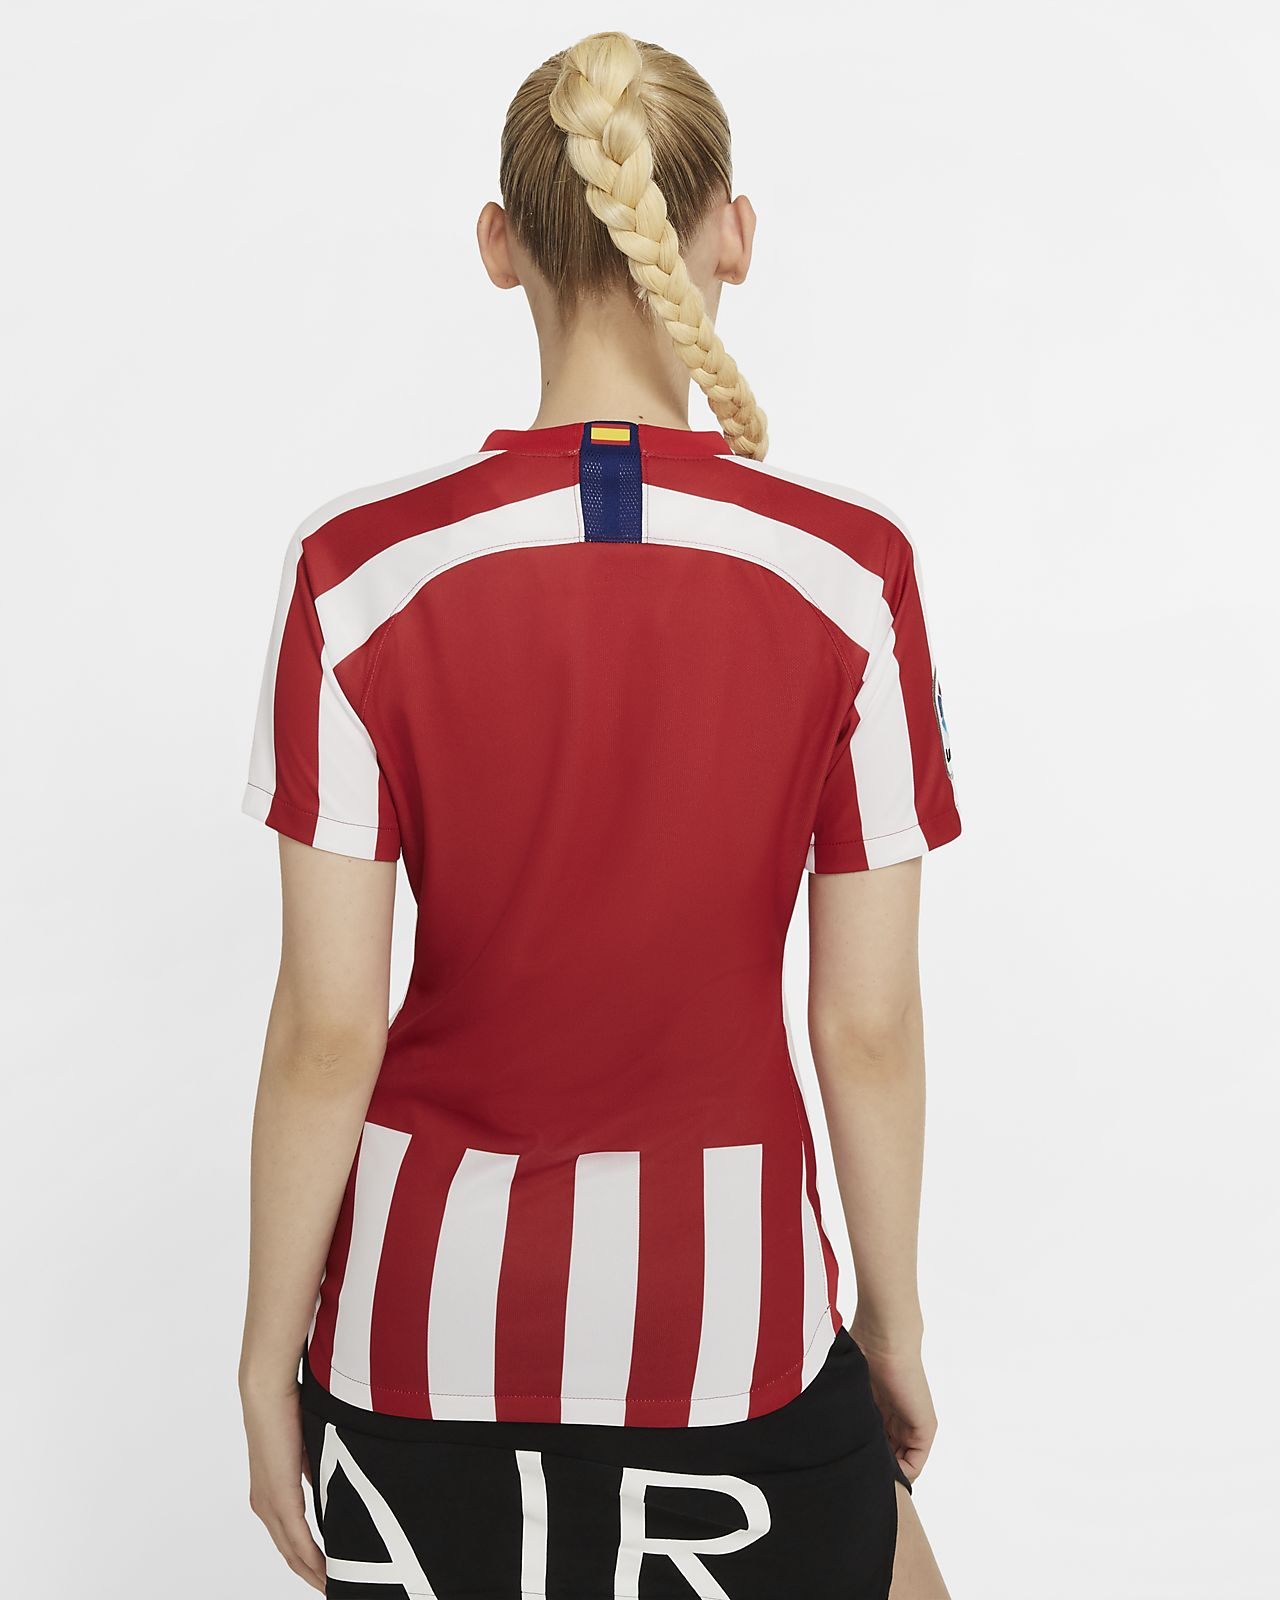 Camiseta Local Atlético 201920 Fútbol Del Para Mujer Stadium Madrid De bgvf76yIY